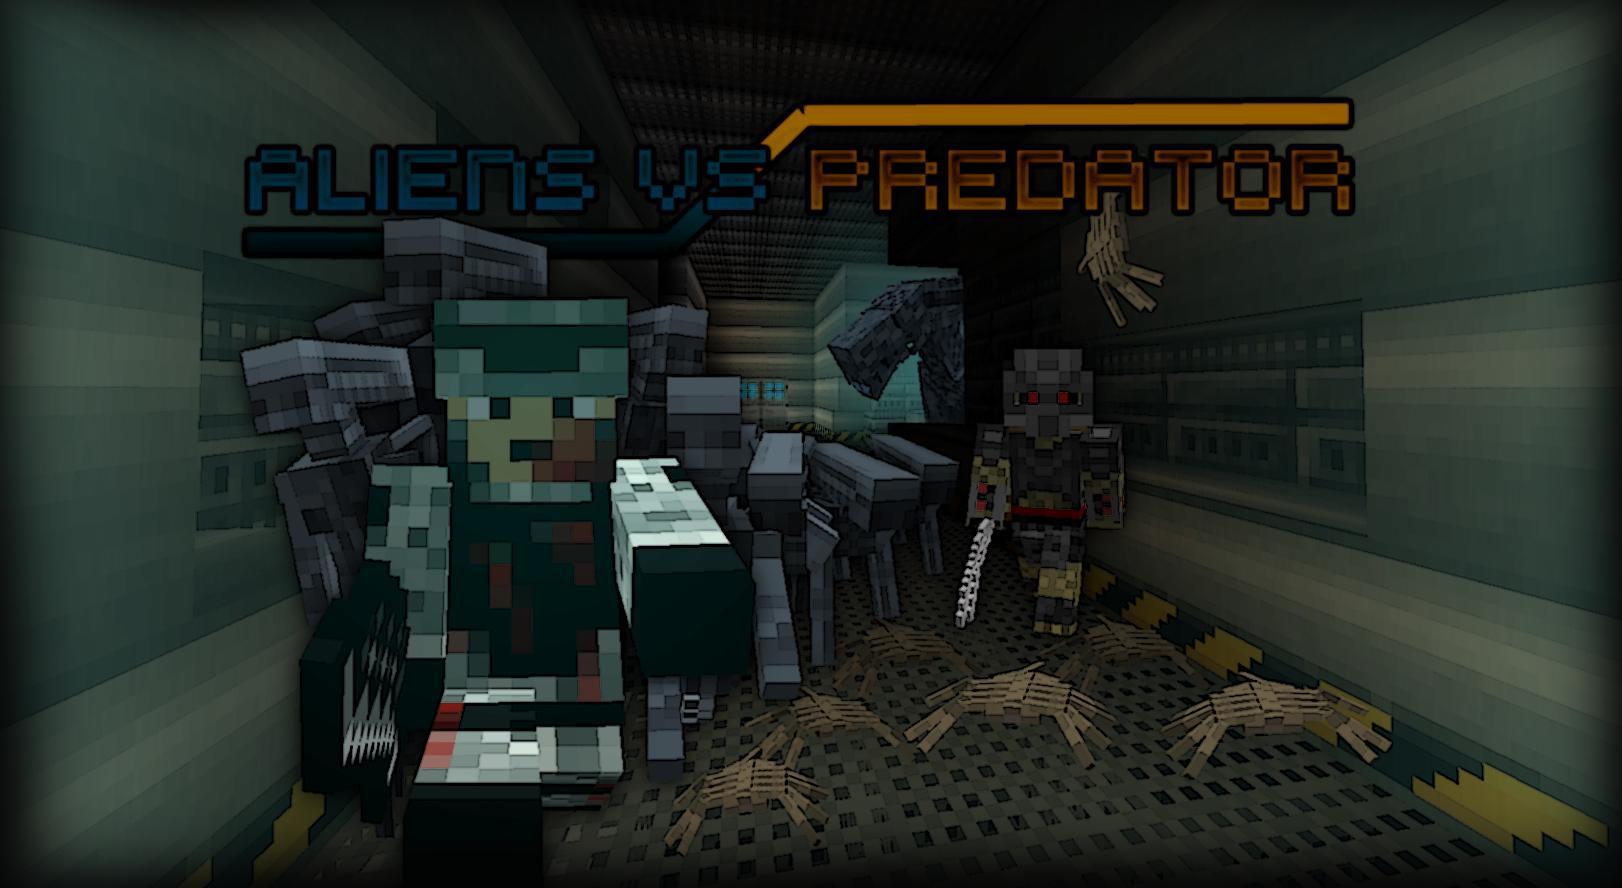 скачать мод на майнкрафт 1.7.10 alien vs predator